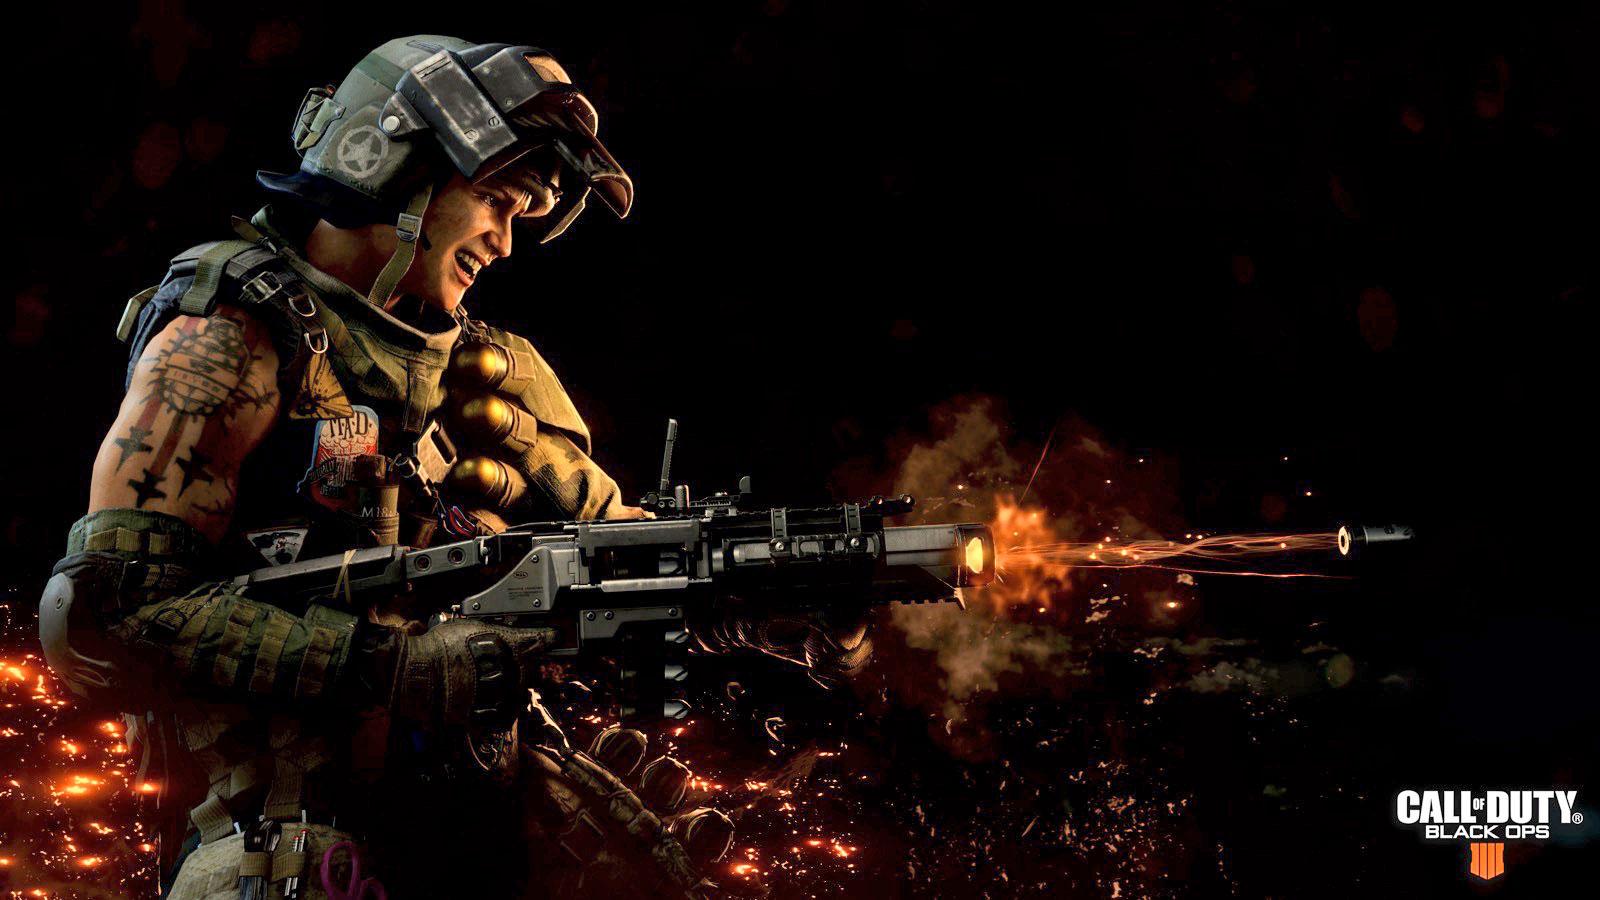 'Call of Duty: Black Ops 4' tweaks a familiar multiplayer formula